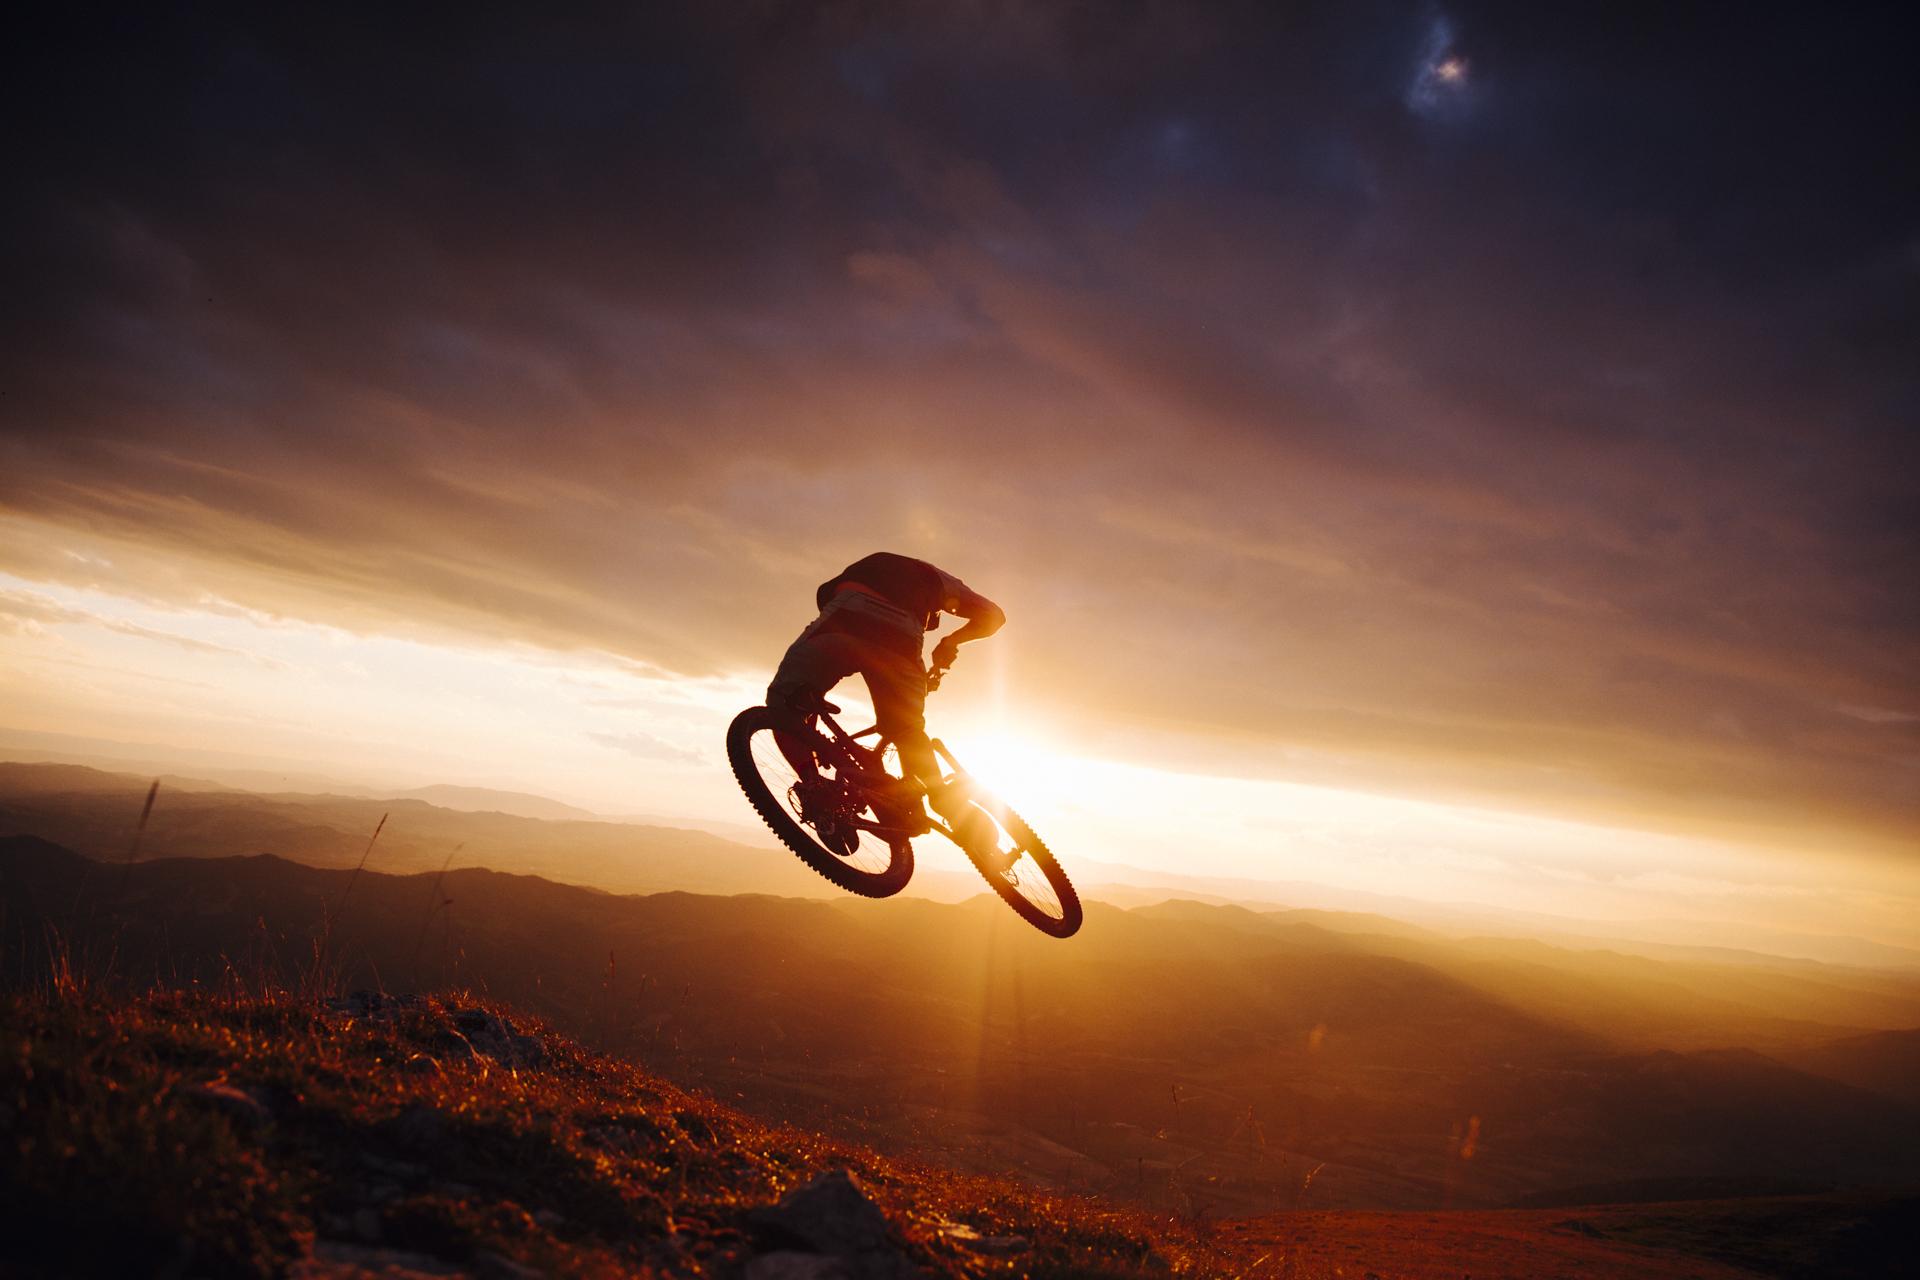 Mpora-Mountain-Biking-Umbria-Dan-Medhurst-3419